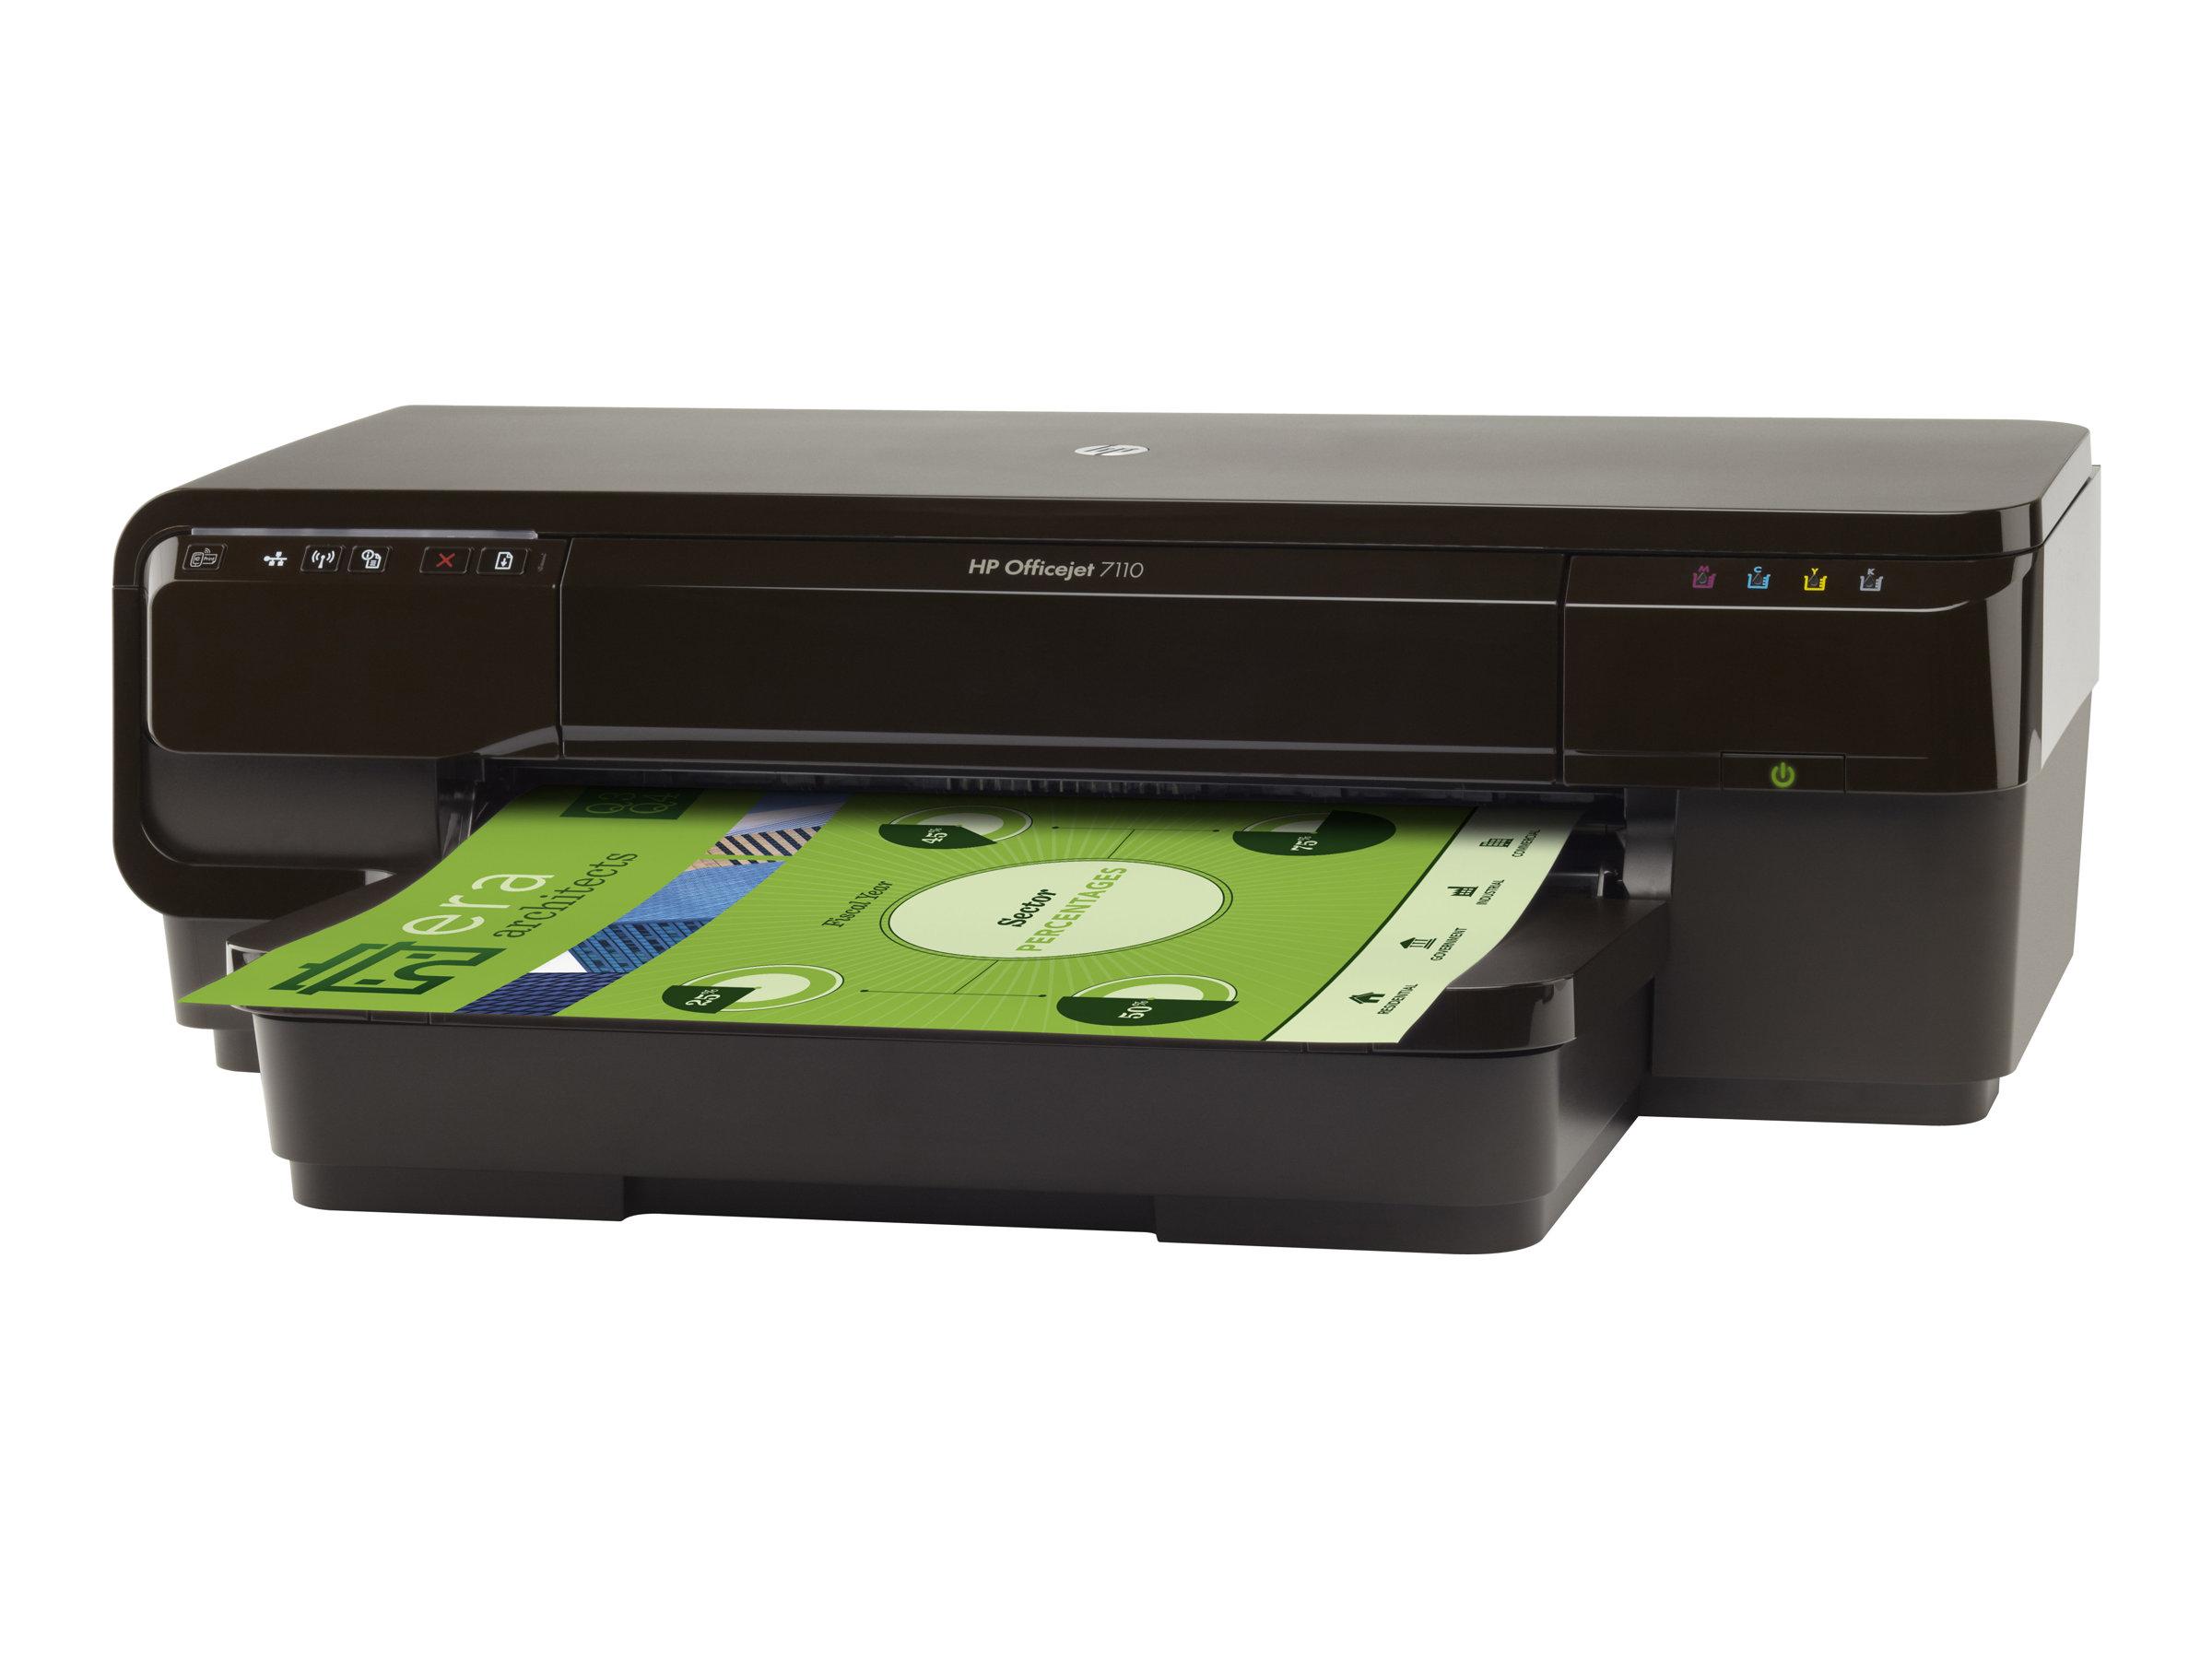 HP Officejet 7110 Wide Format ePrinter - Drucker - Farbe - Duplex - Tintenstrahl - A3